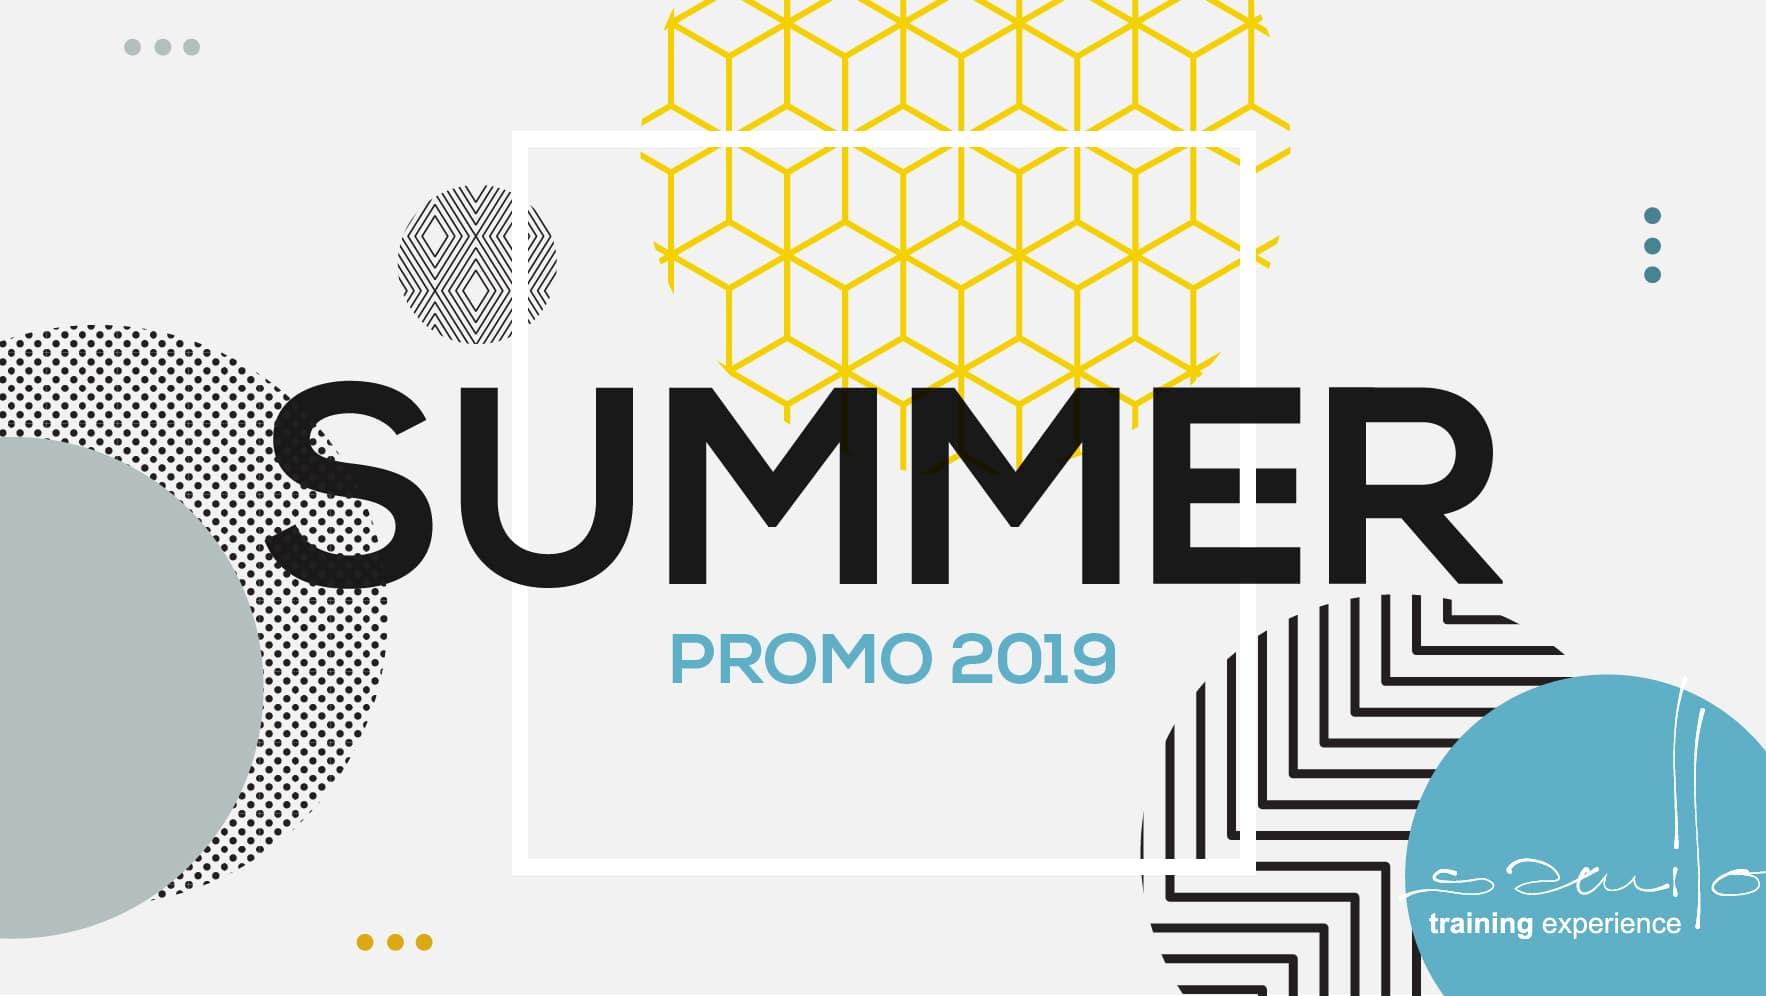 Promo Summer 2019